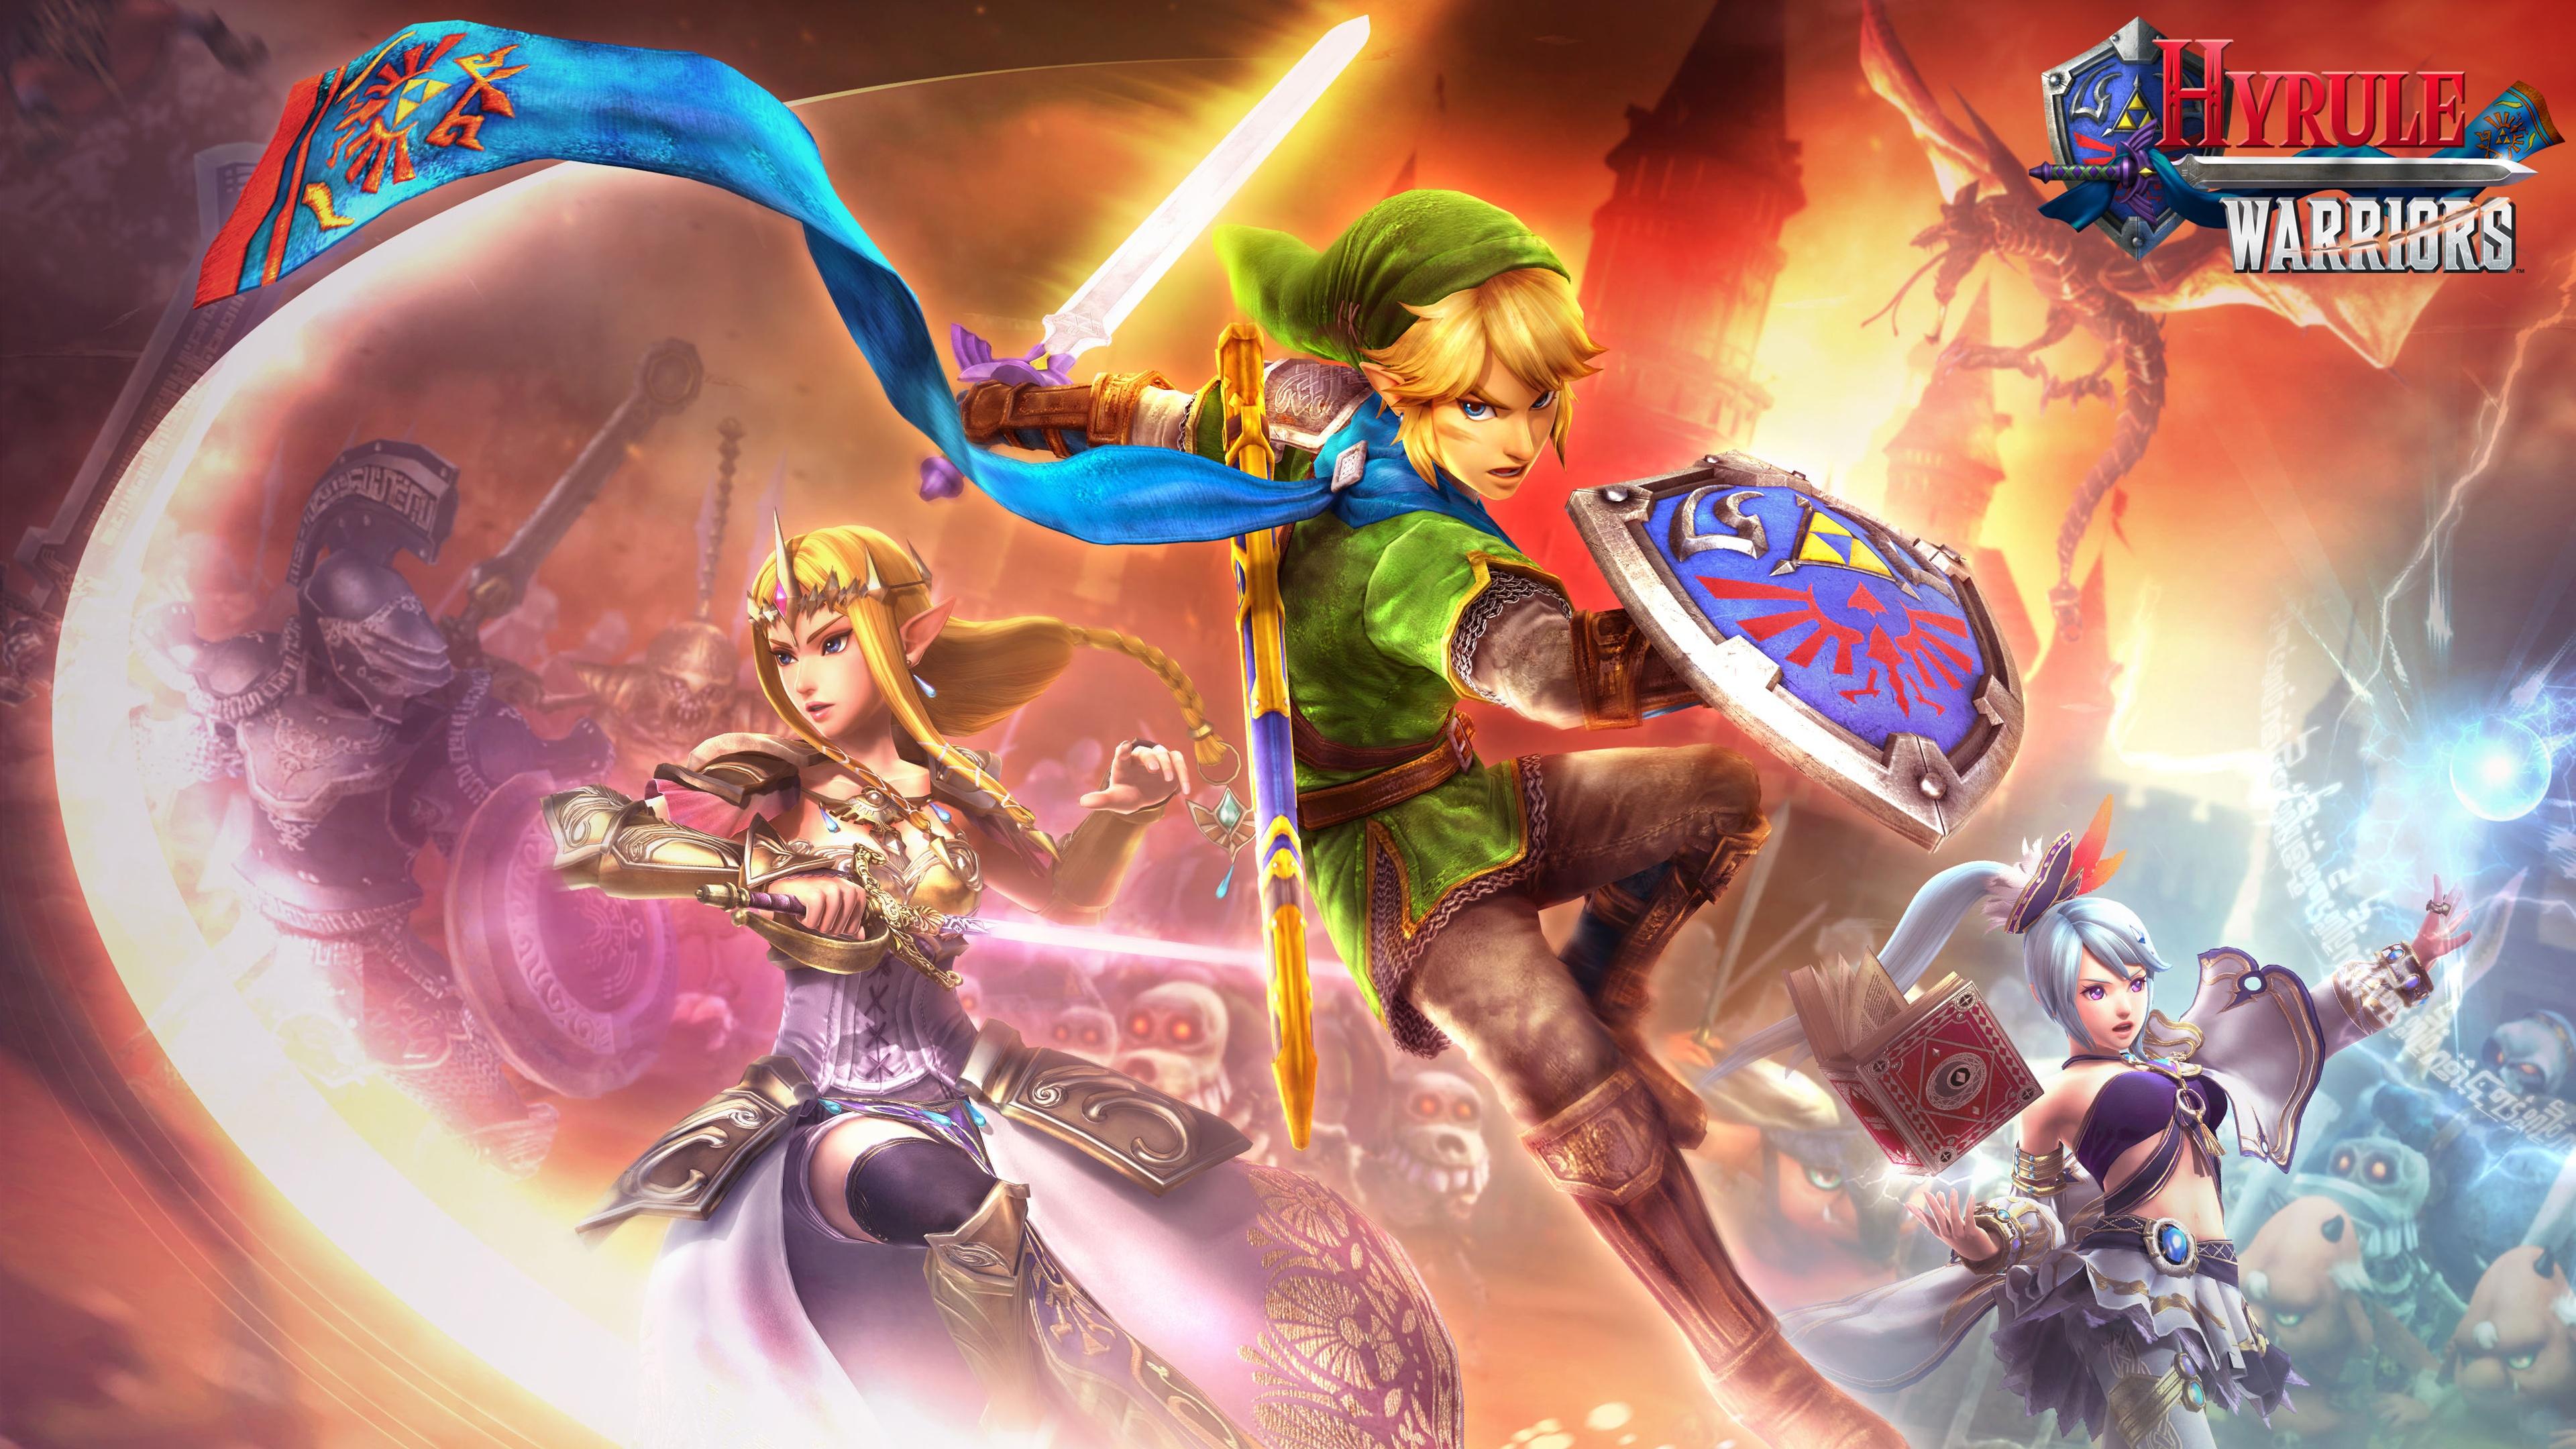 Hyrule Warriors Nintendo Wii U Game Wallpapers HD Wallpapers 3840x2160